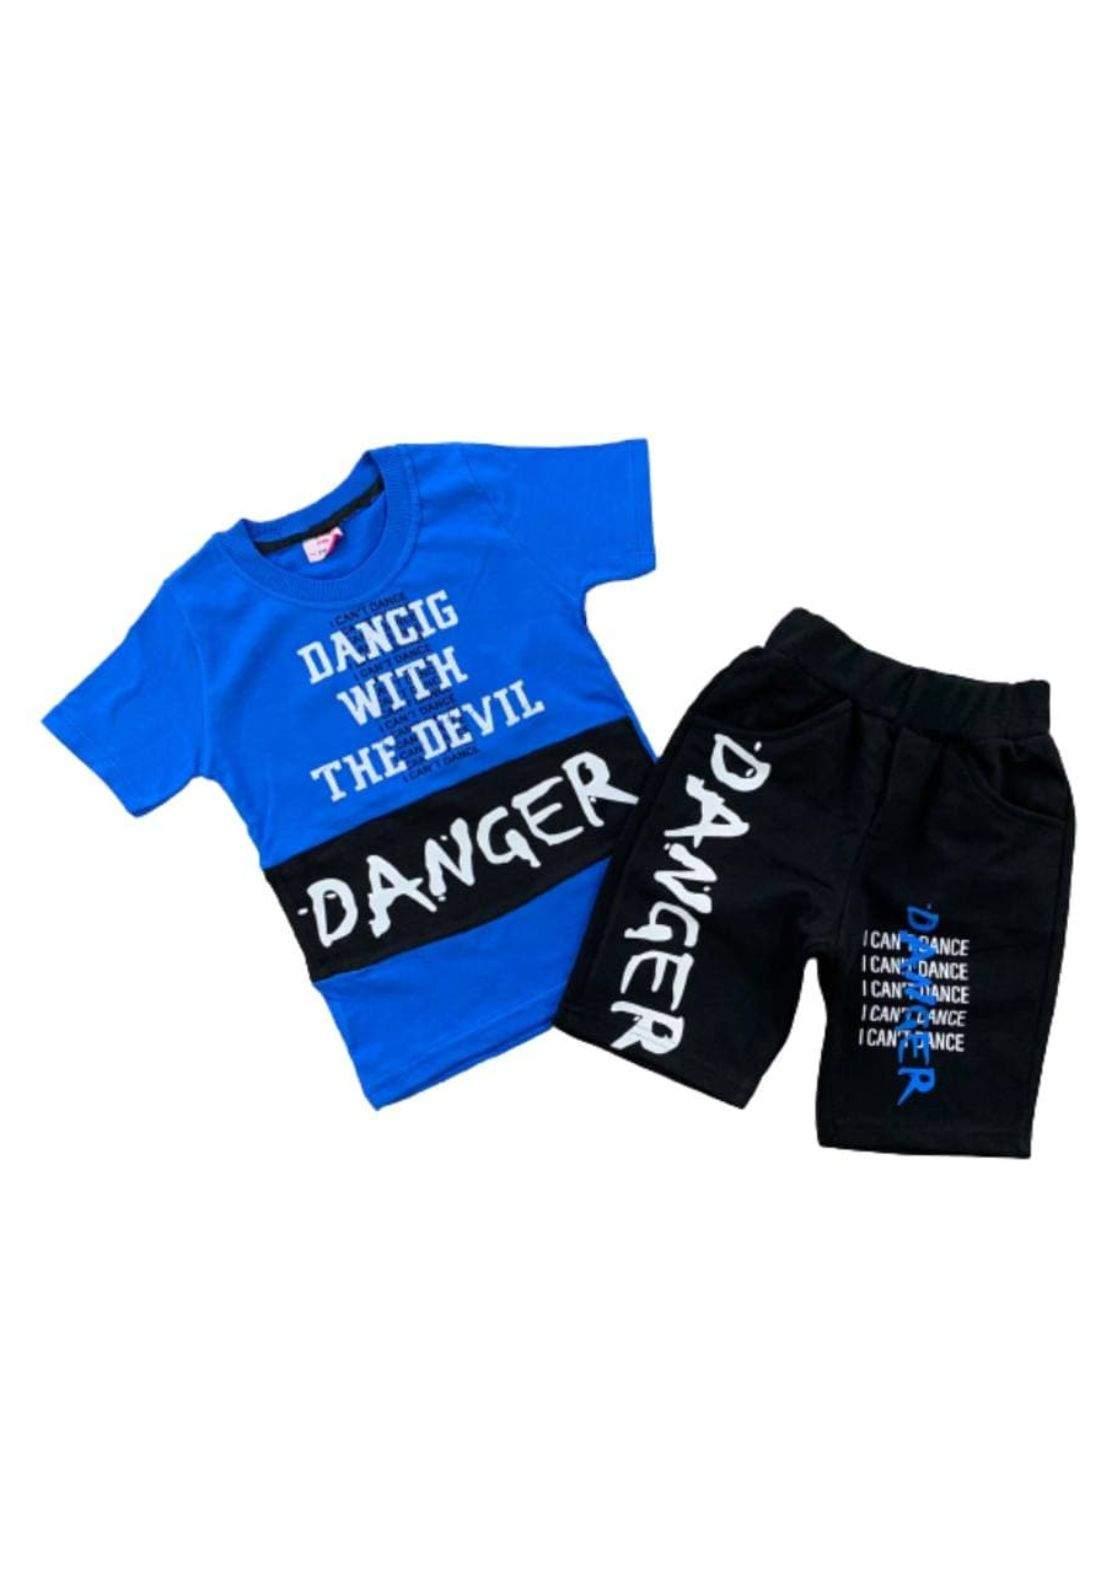 tracksuit for boys blue  (t-shirt+short) ( تراكسوت ولادي ازرق  (شورت و تيشيرت